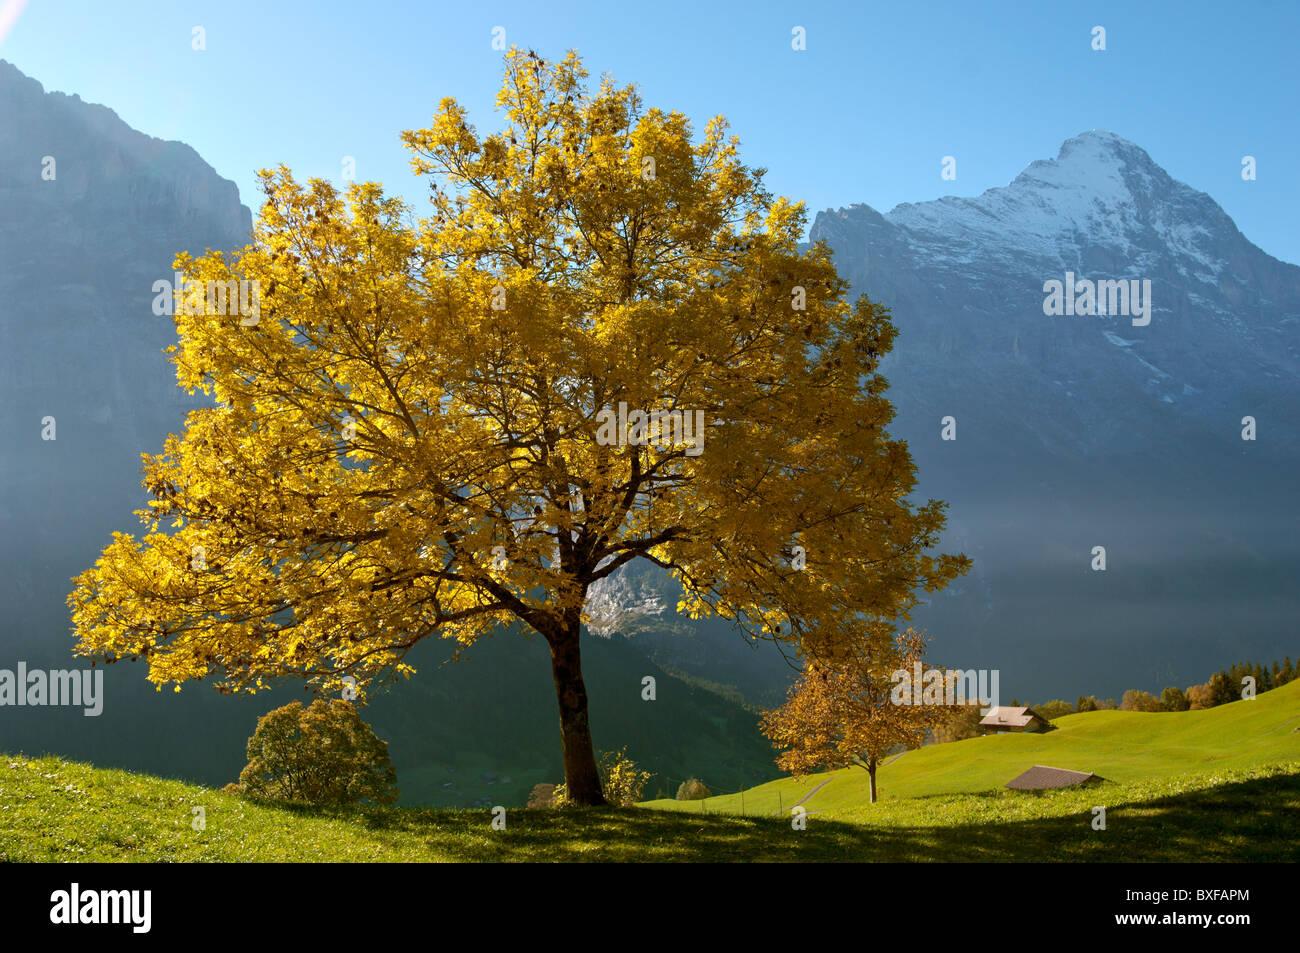 Autumn trees in the Swiss Alps, Grindelwald, Switzerland - Stock Image